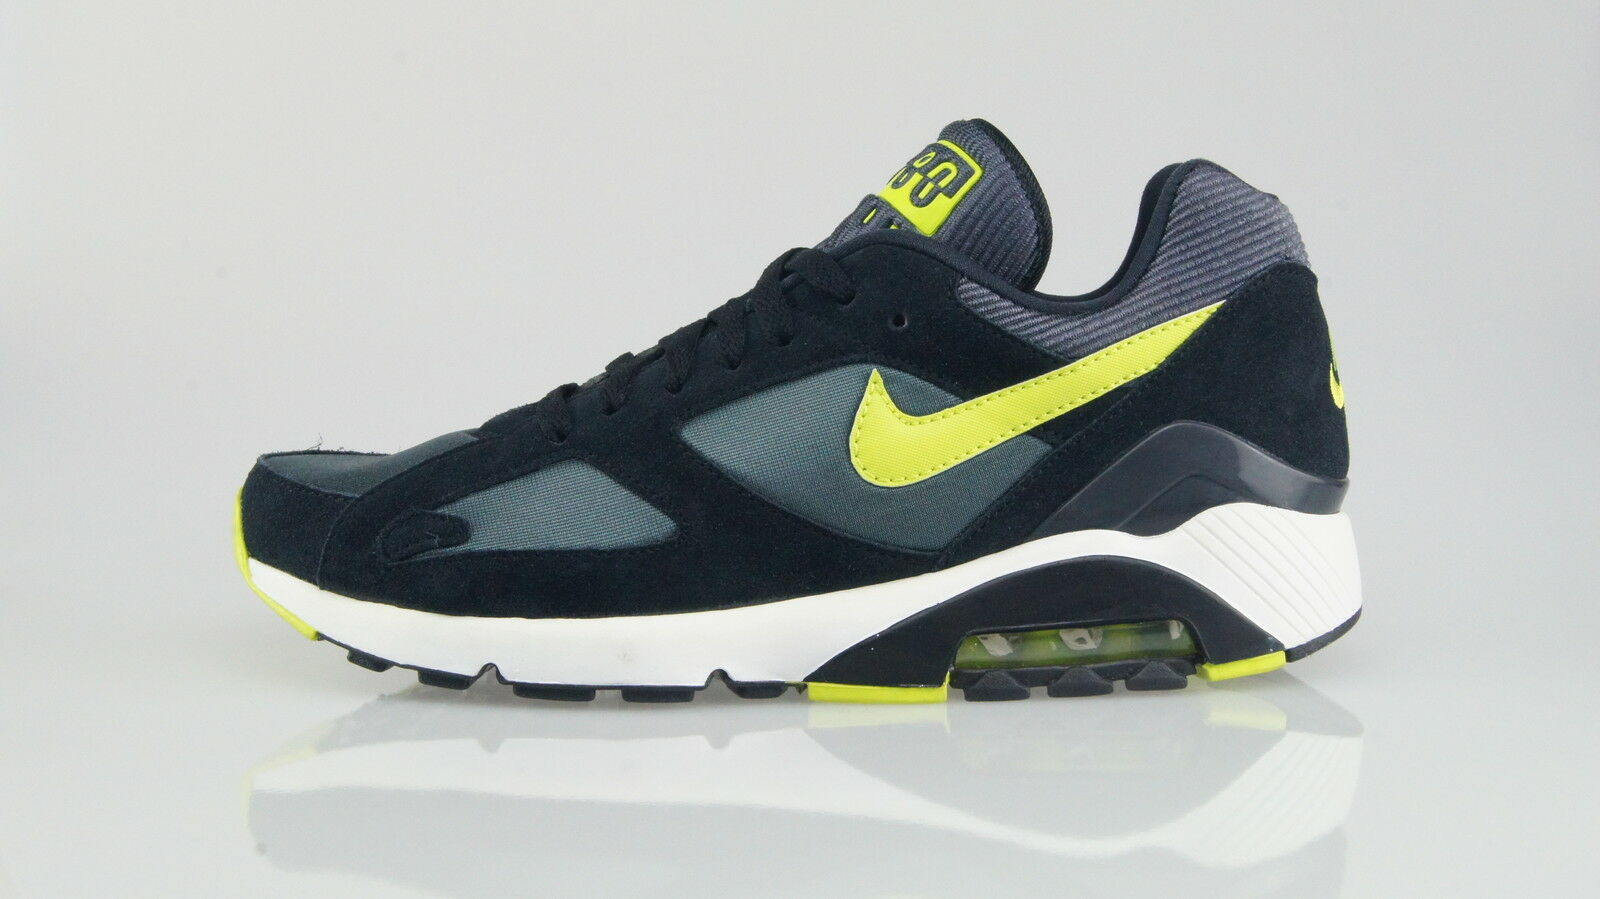 Nike air Max 180 Größe 43 (9,5US) Heute empfohlen